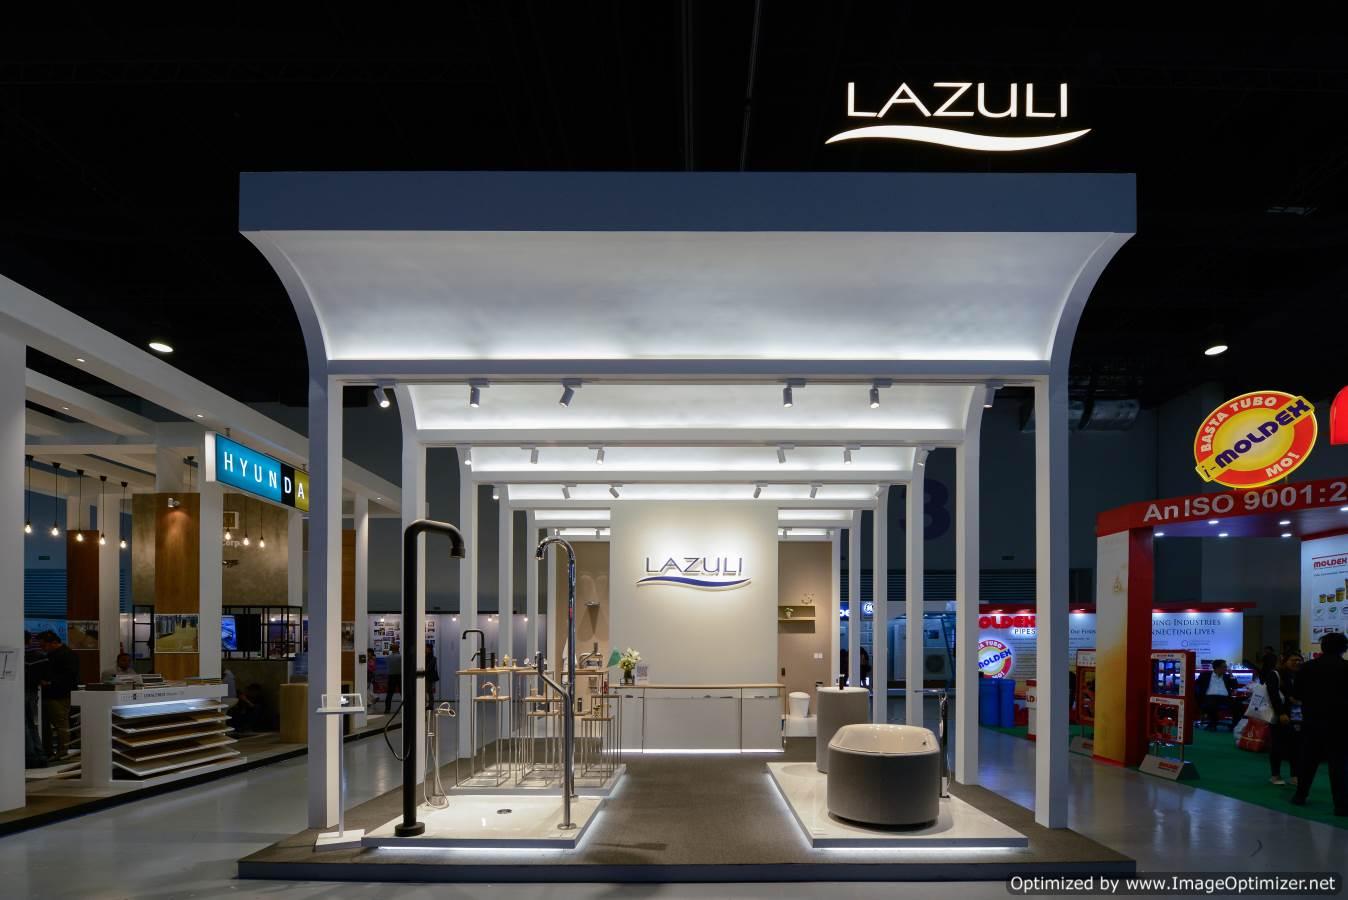 Lazuli booth at CONEX 2018